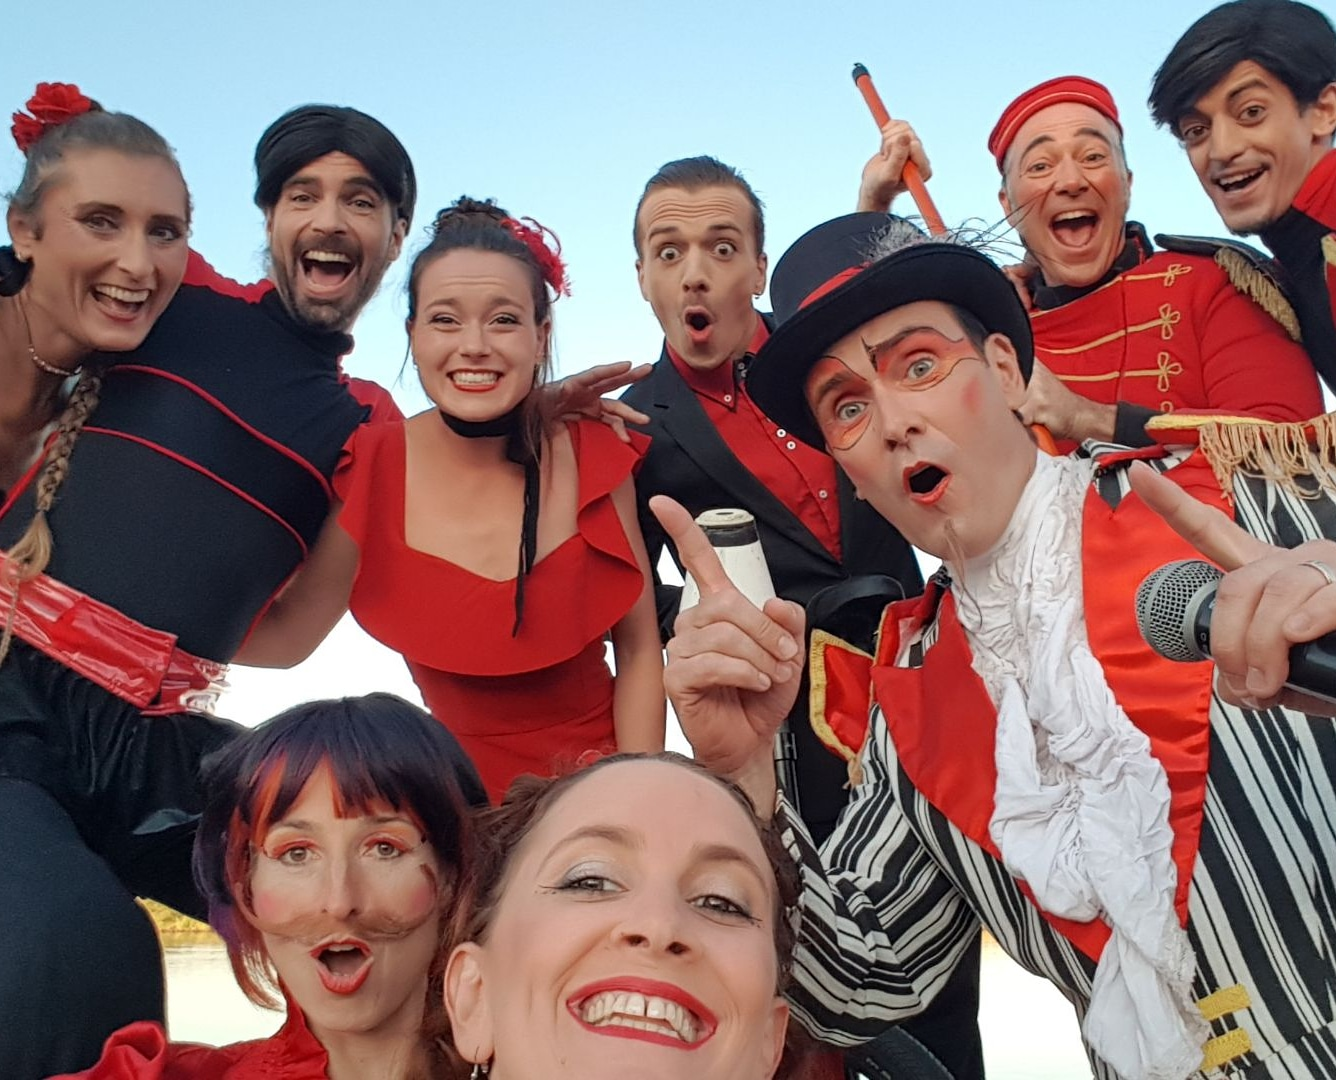 Parade du Cirque Valras